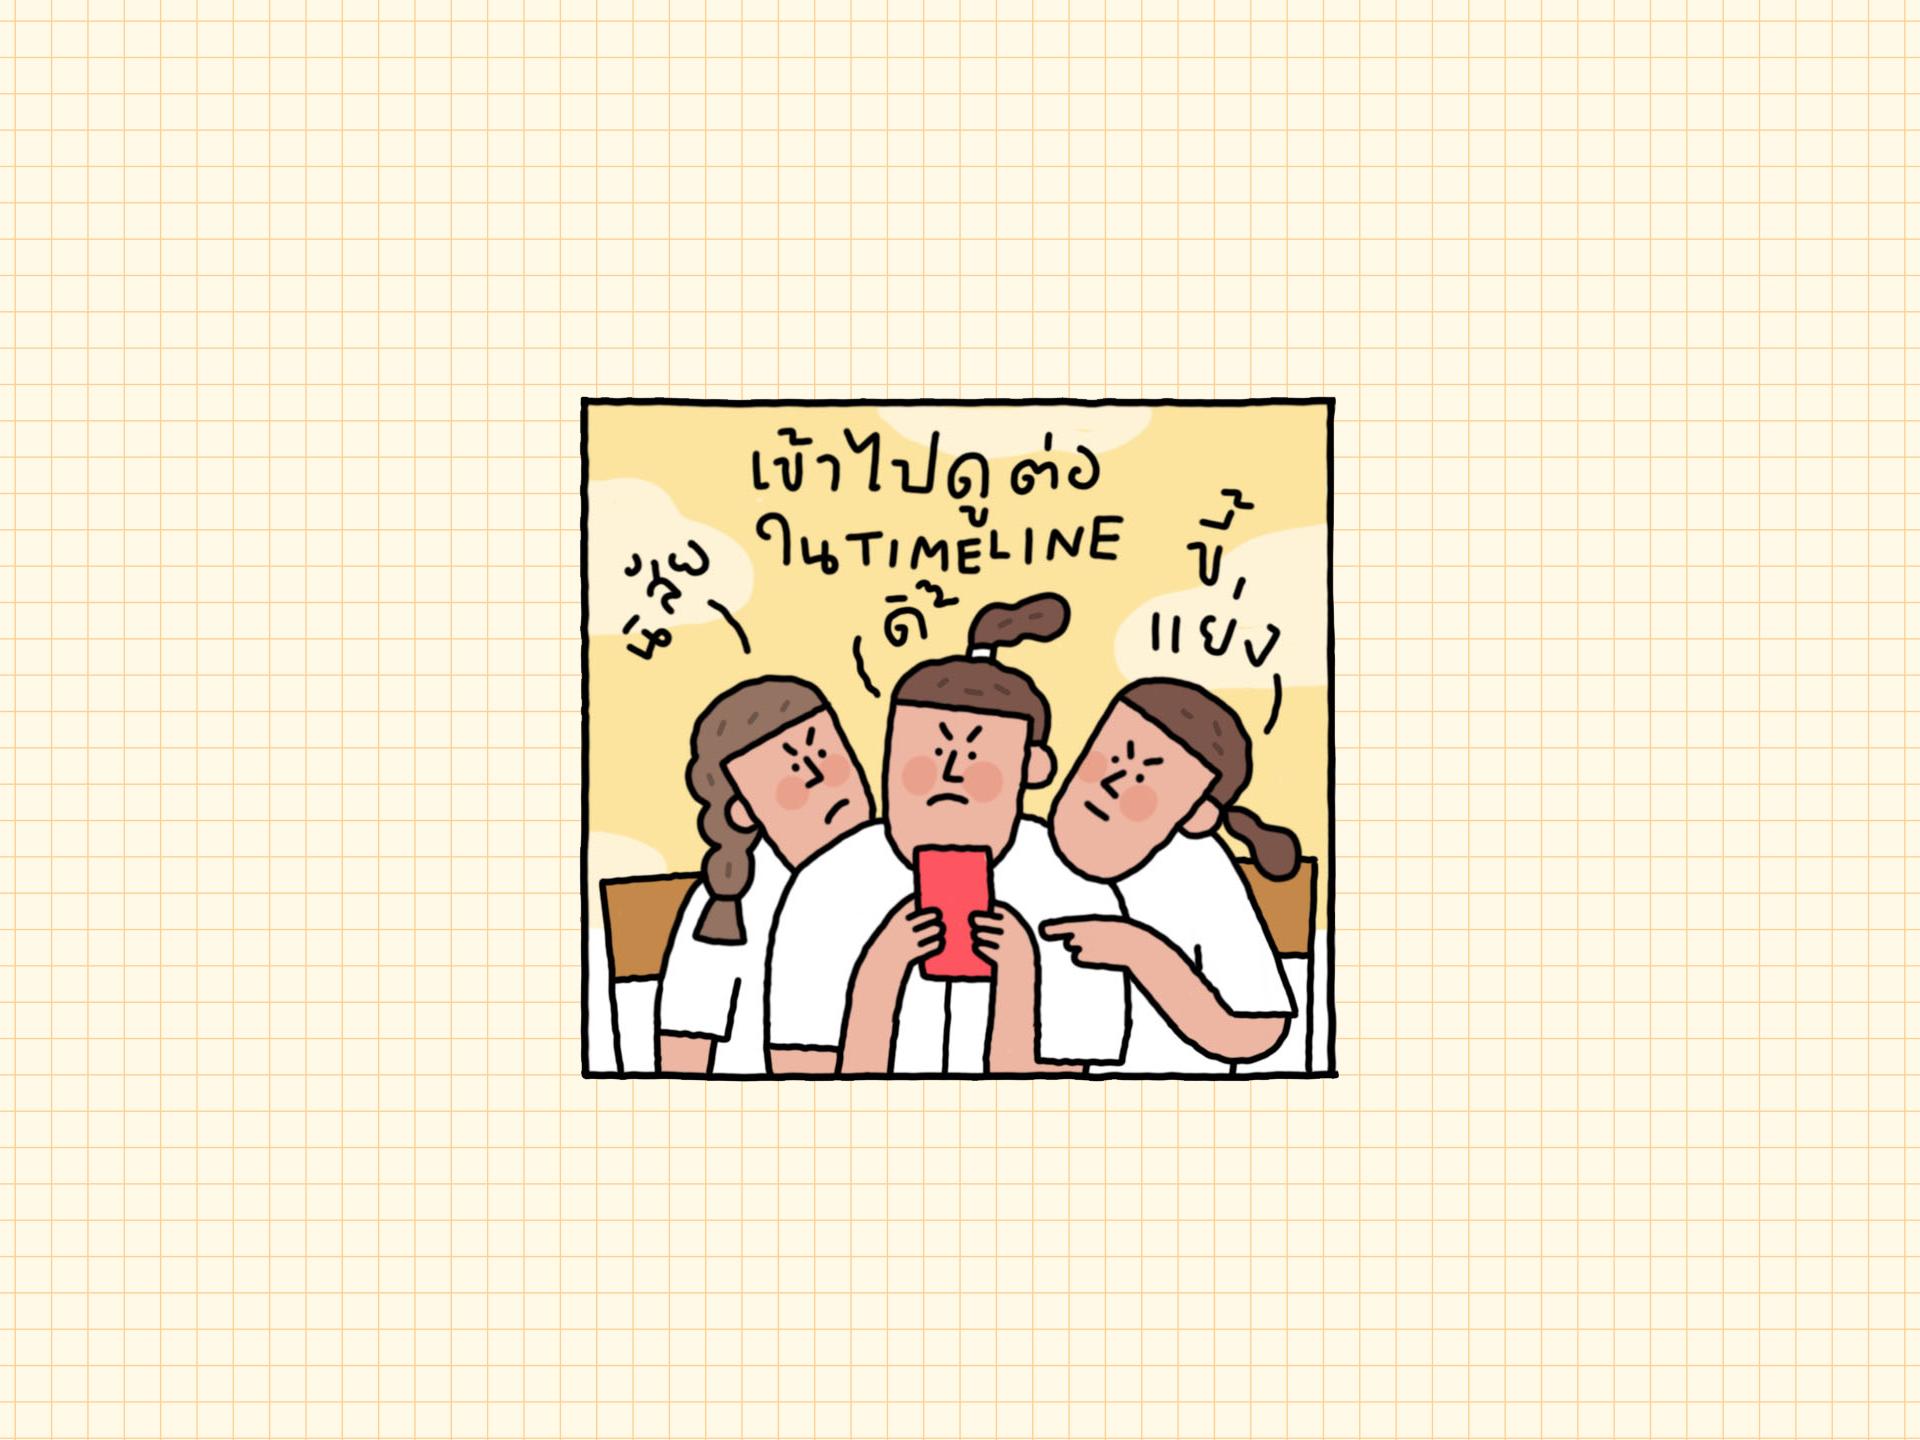 fake news ข่าวปลอม khae